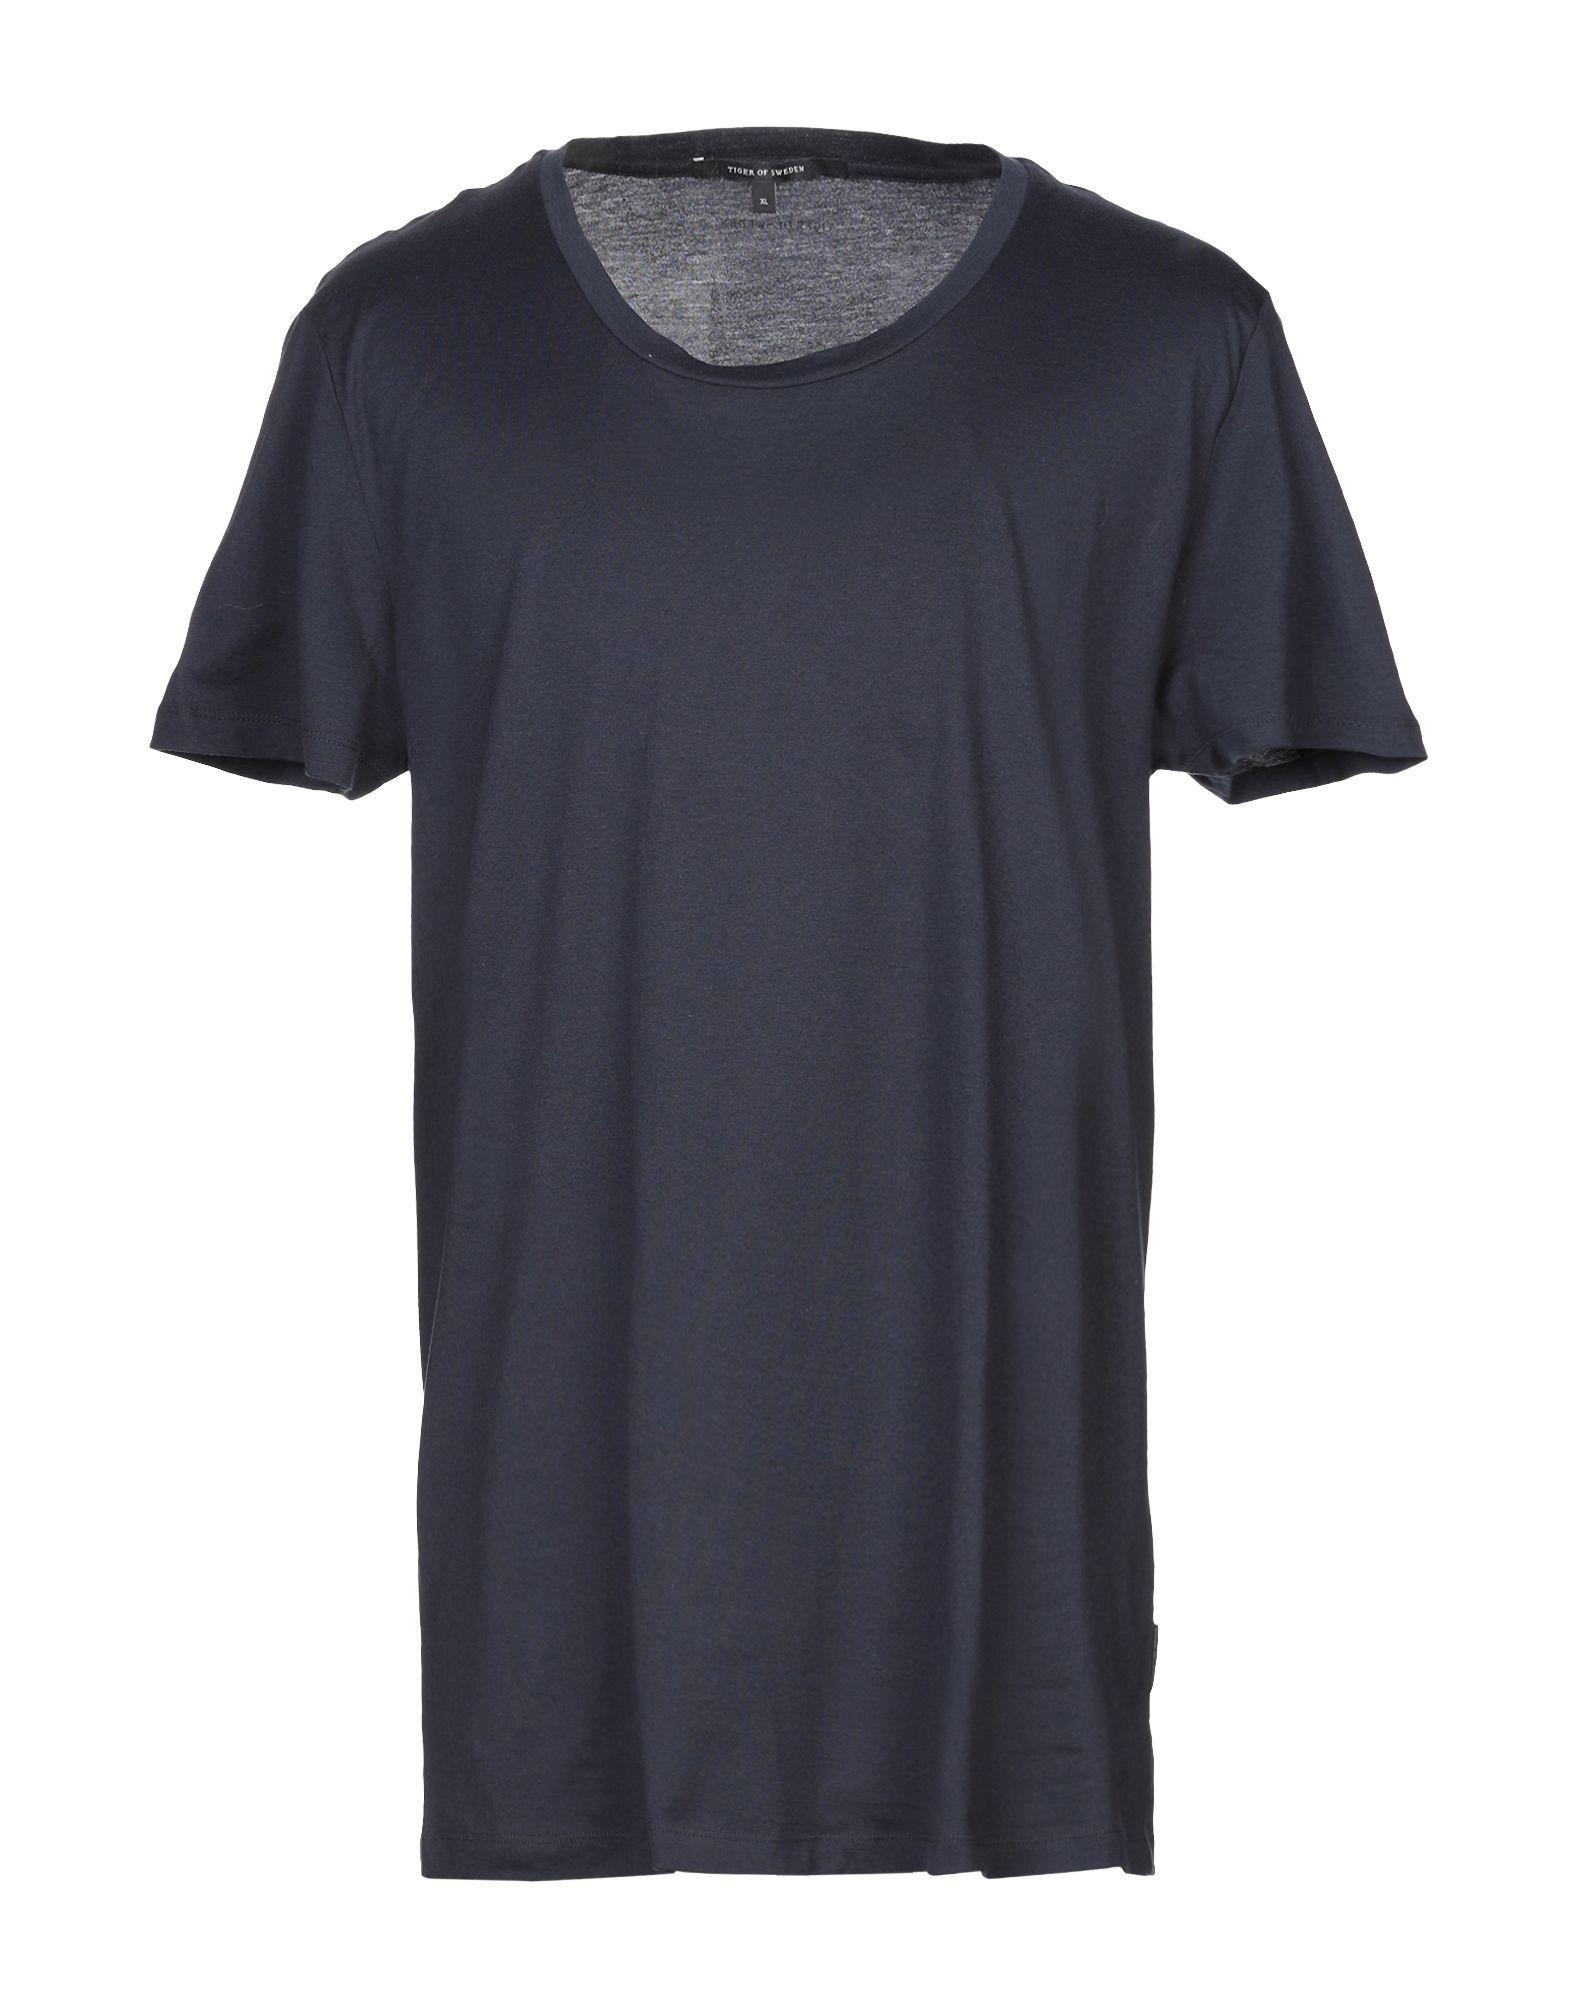 Tiger Of Sweden Blue Cotton T-Shirt